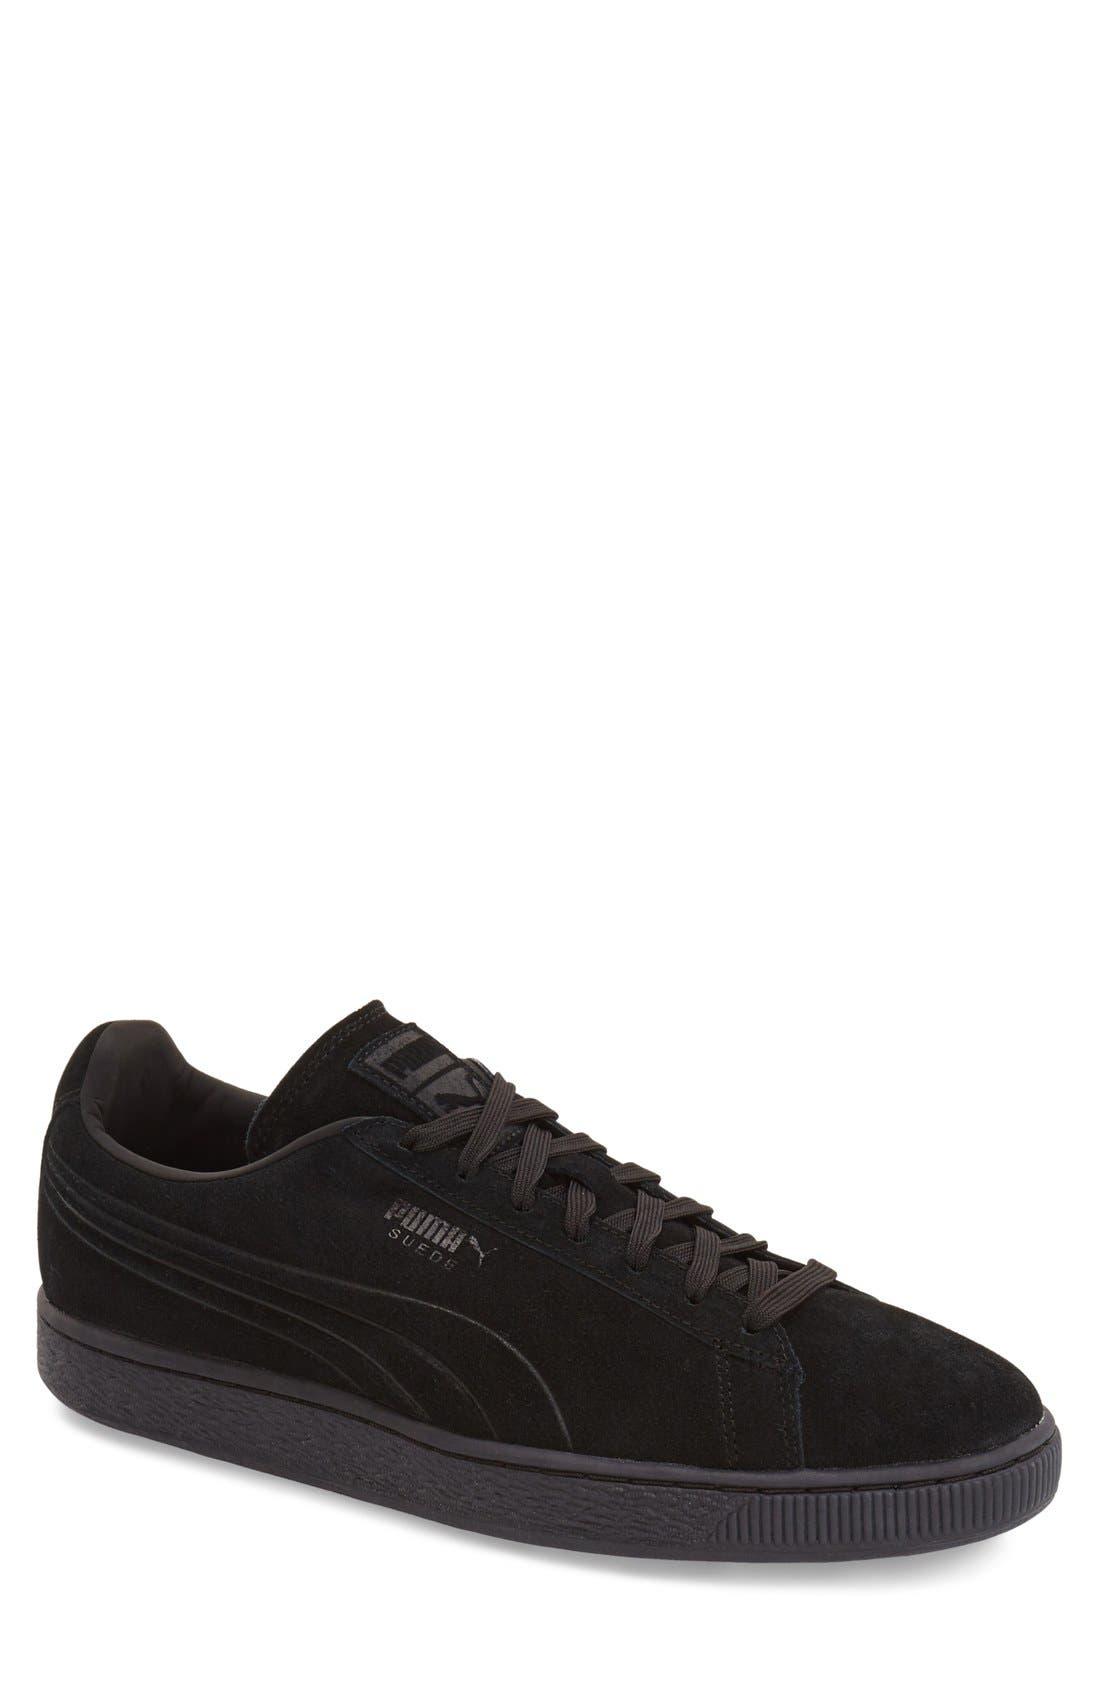 Main Image - PUMA 'Suede Iced' Sneaker (Men)